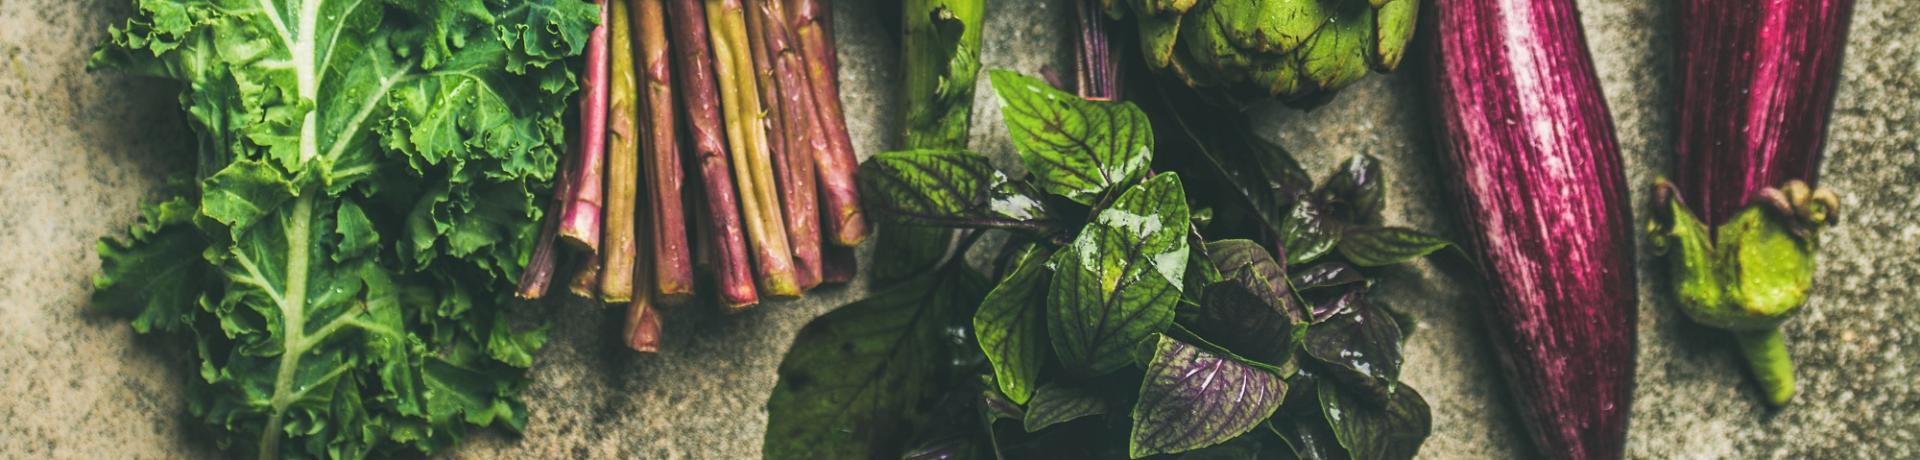 Vegetarisch vegan Gemüse Emotion